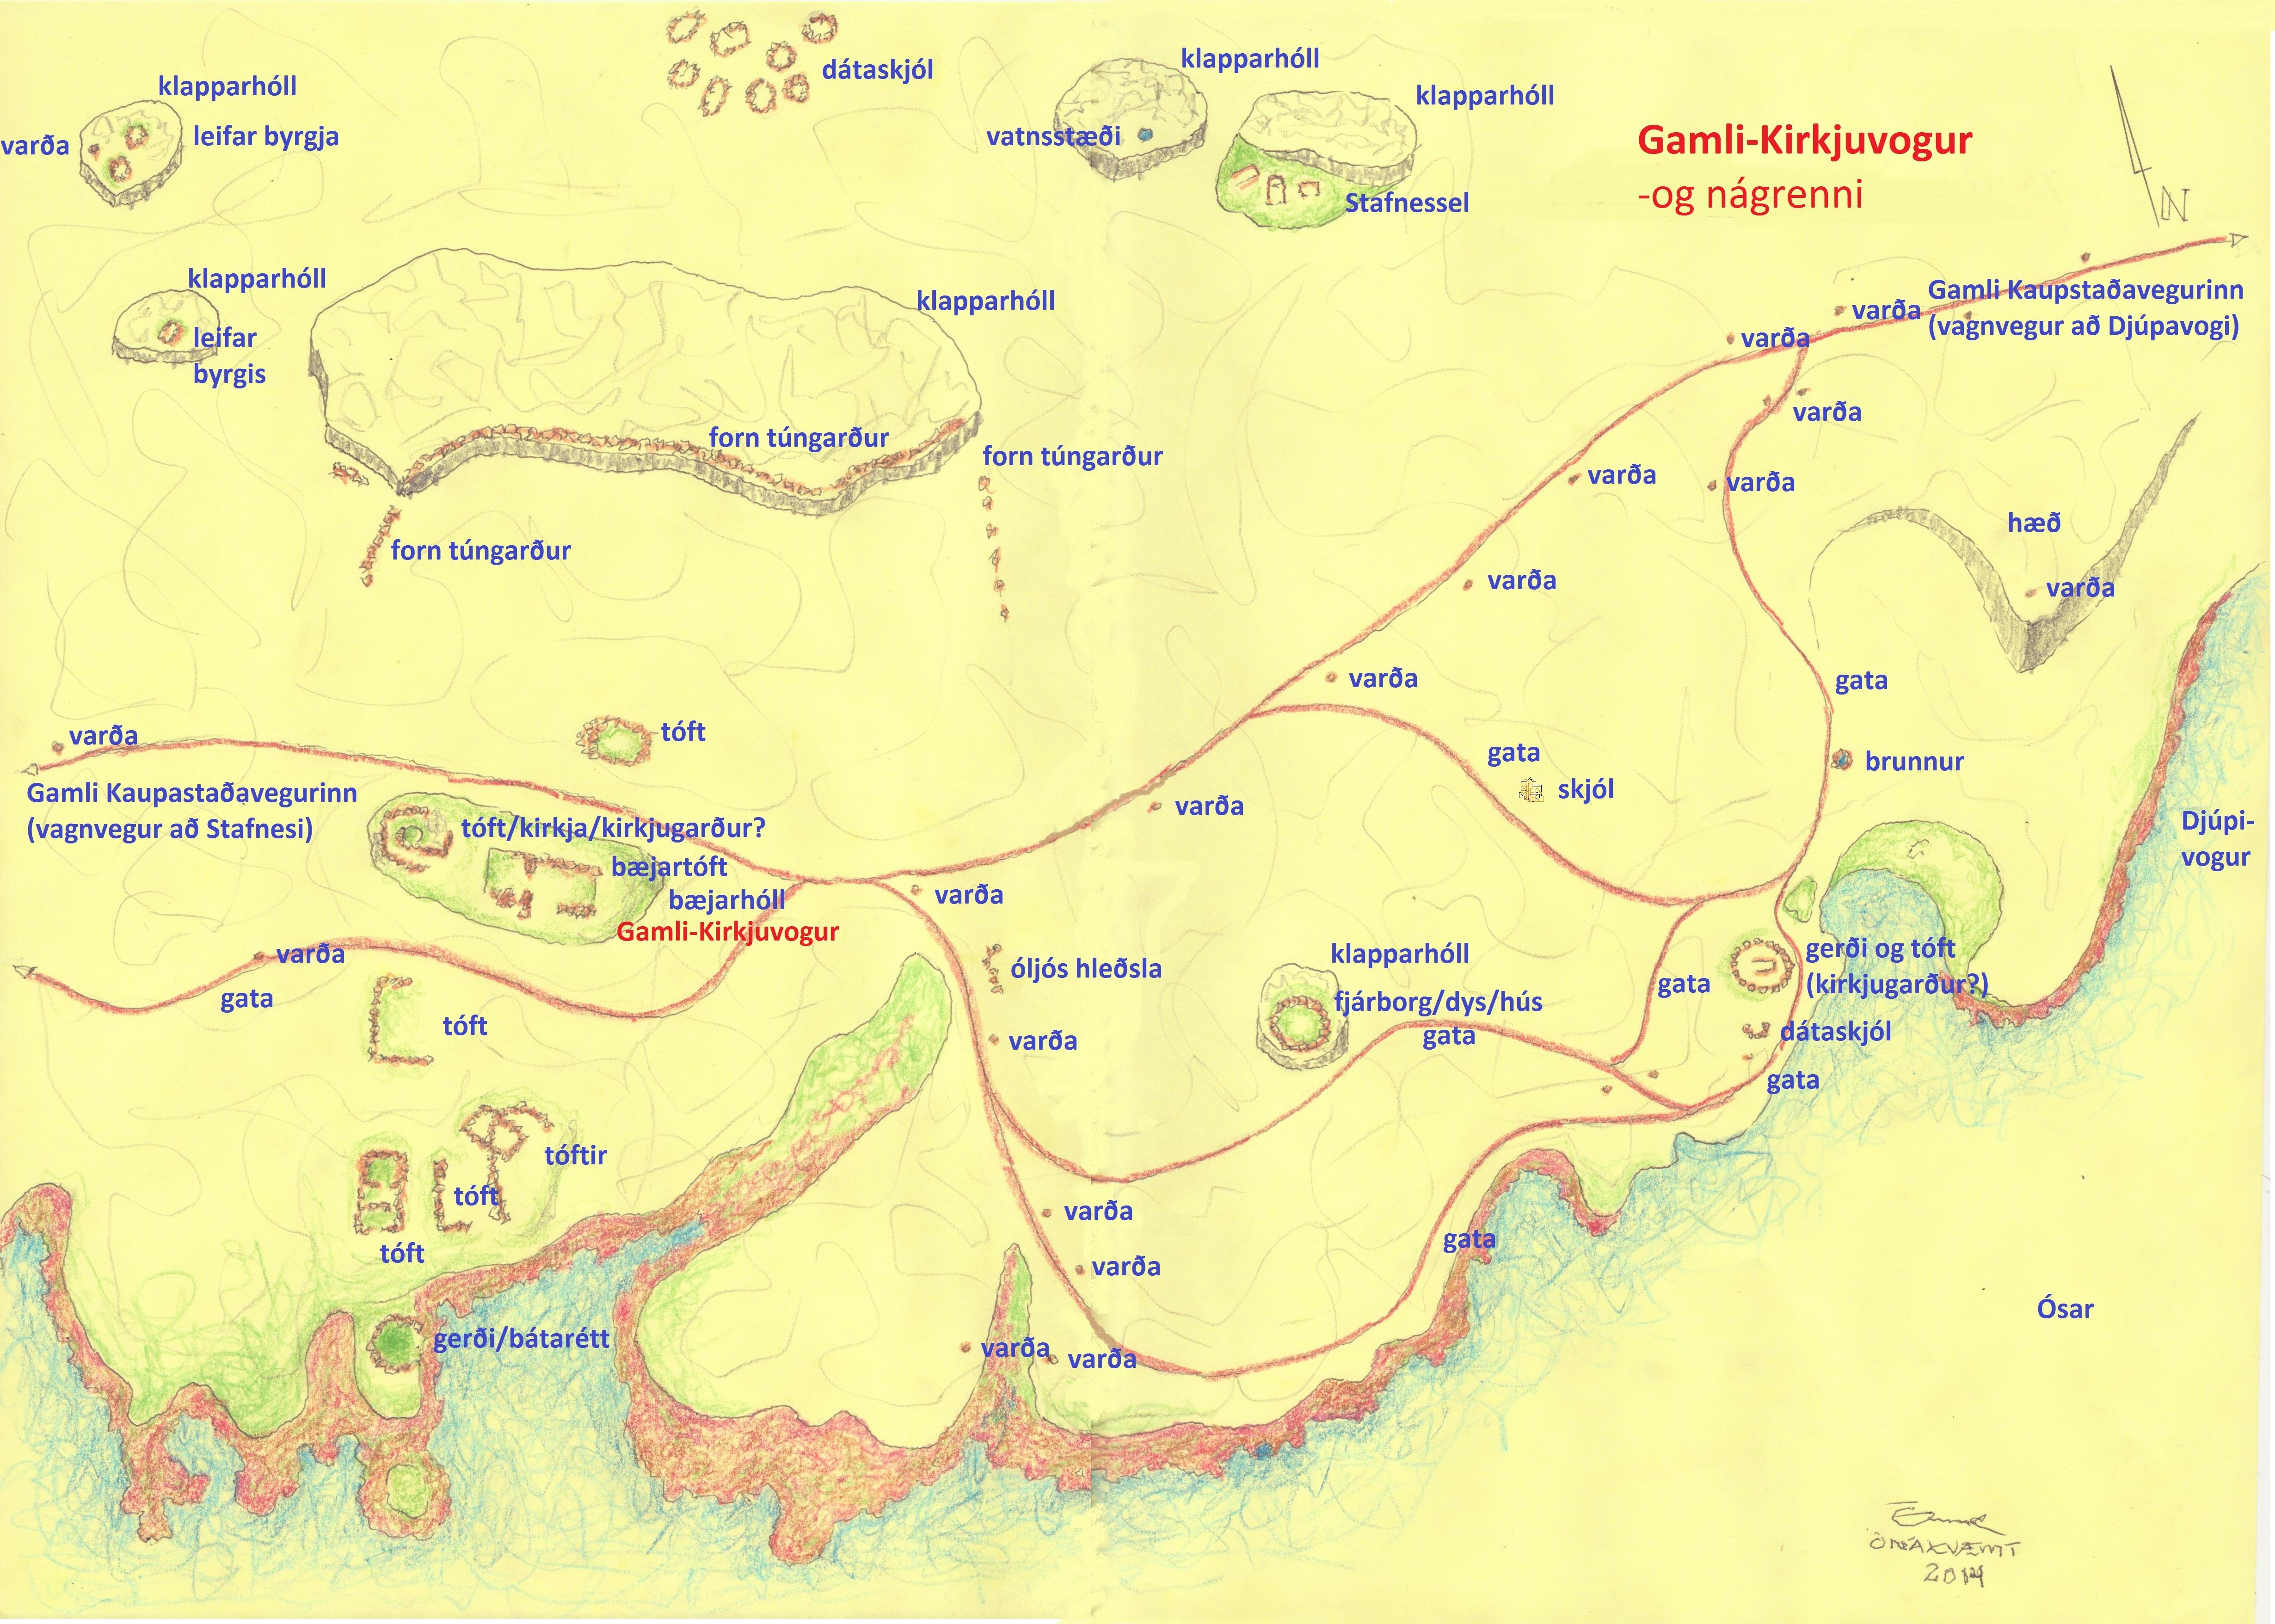 Gamli-Kirkjuvogur-uppdrattur 2014